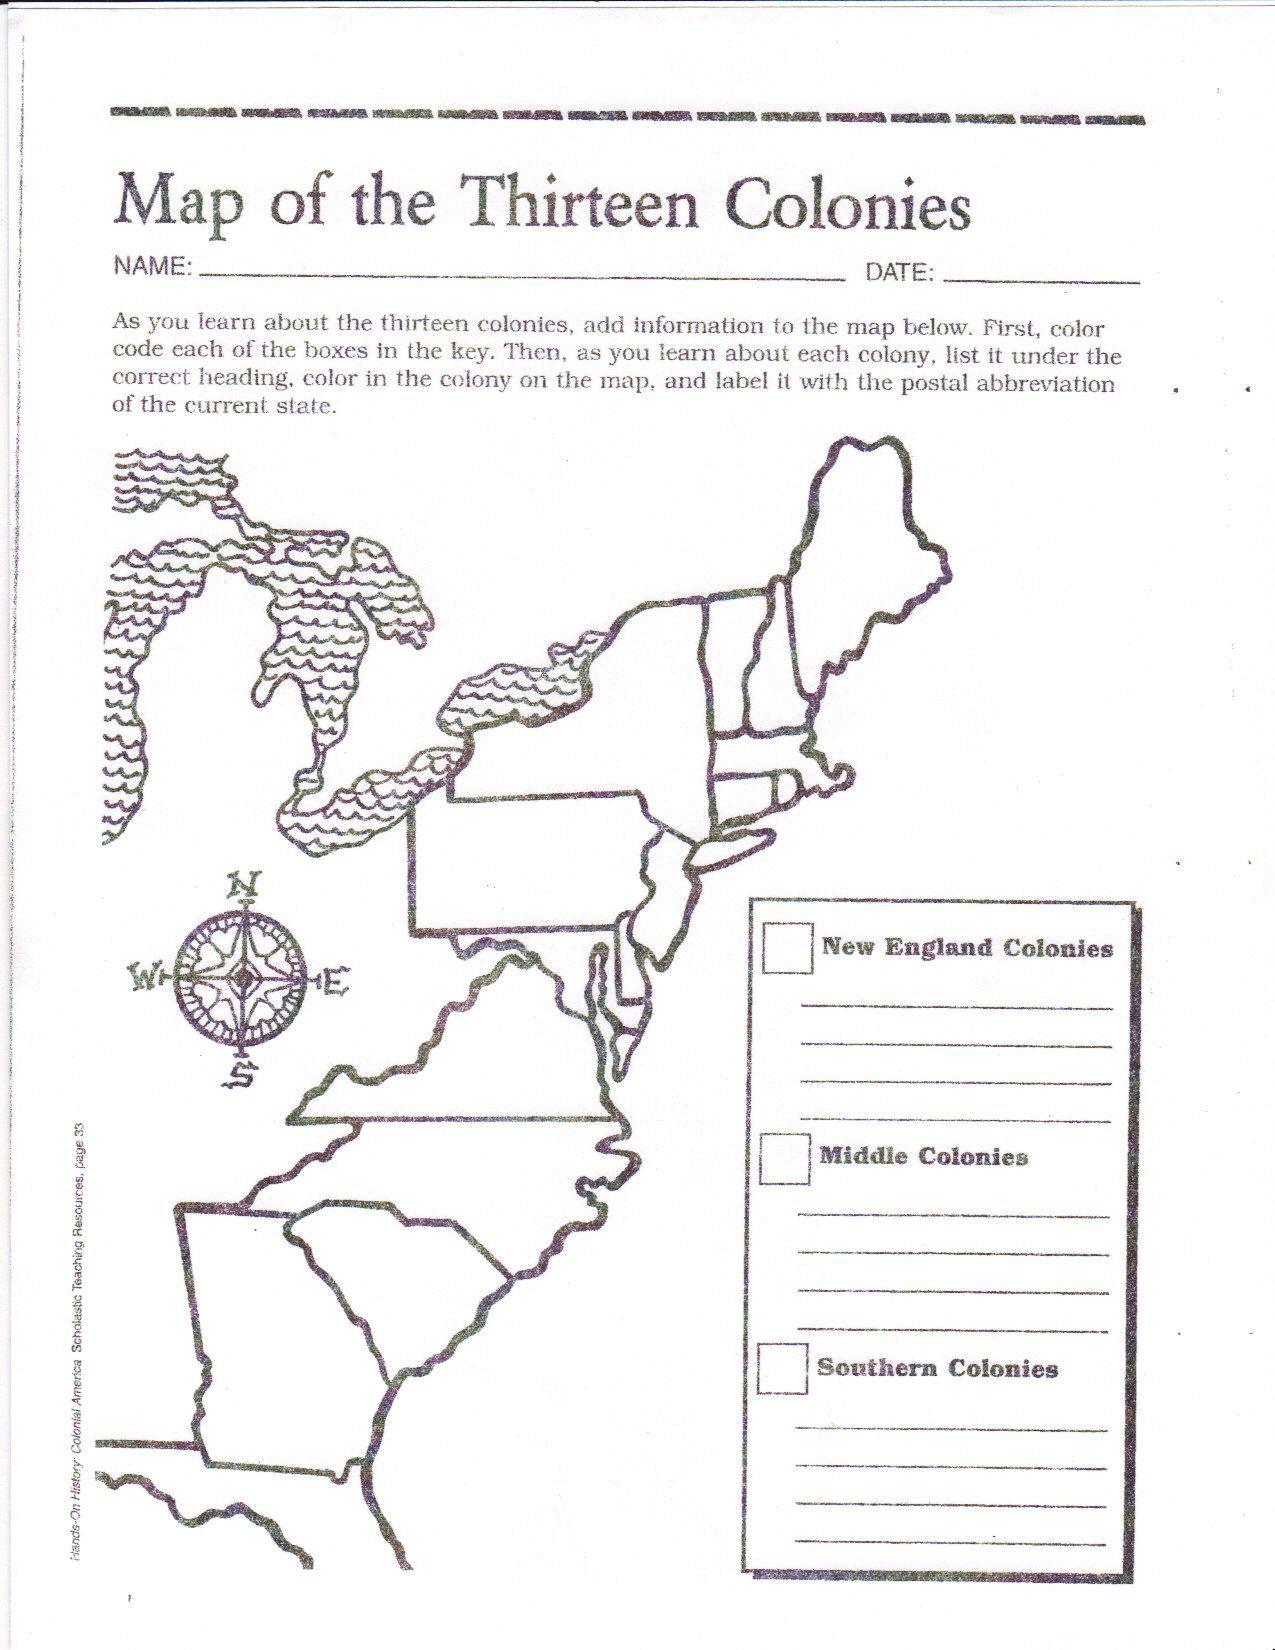 small resolution of 13 Colonies Worksheet Pdf Blank Map Of the 13 original Colonies Google  Search   Social studies worksheets